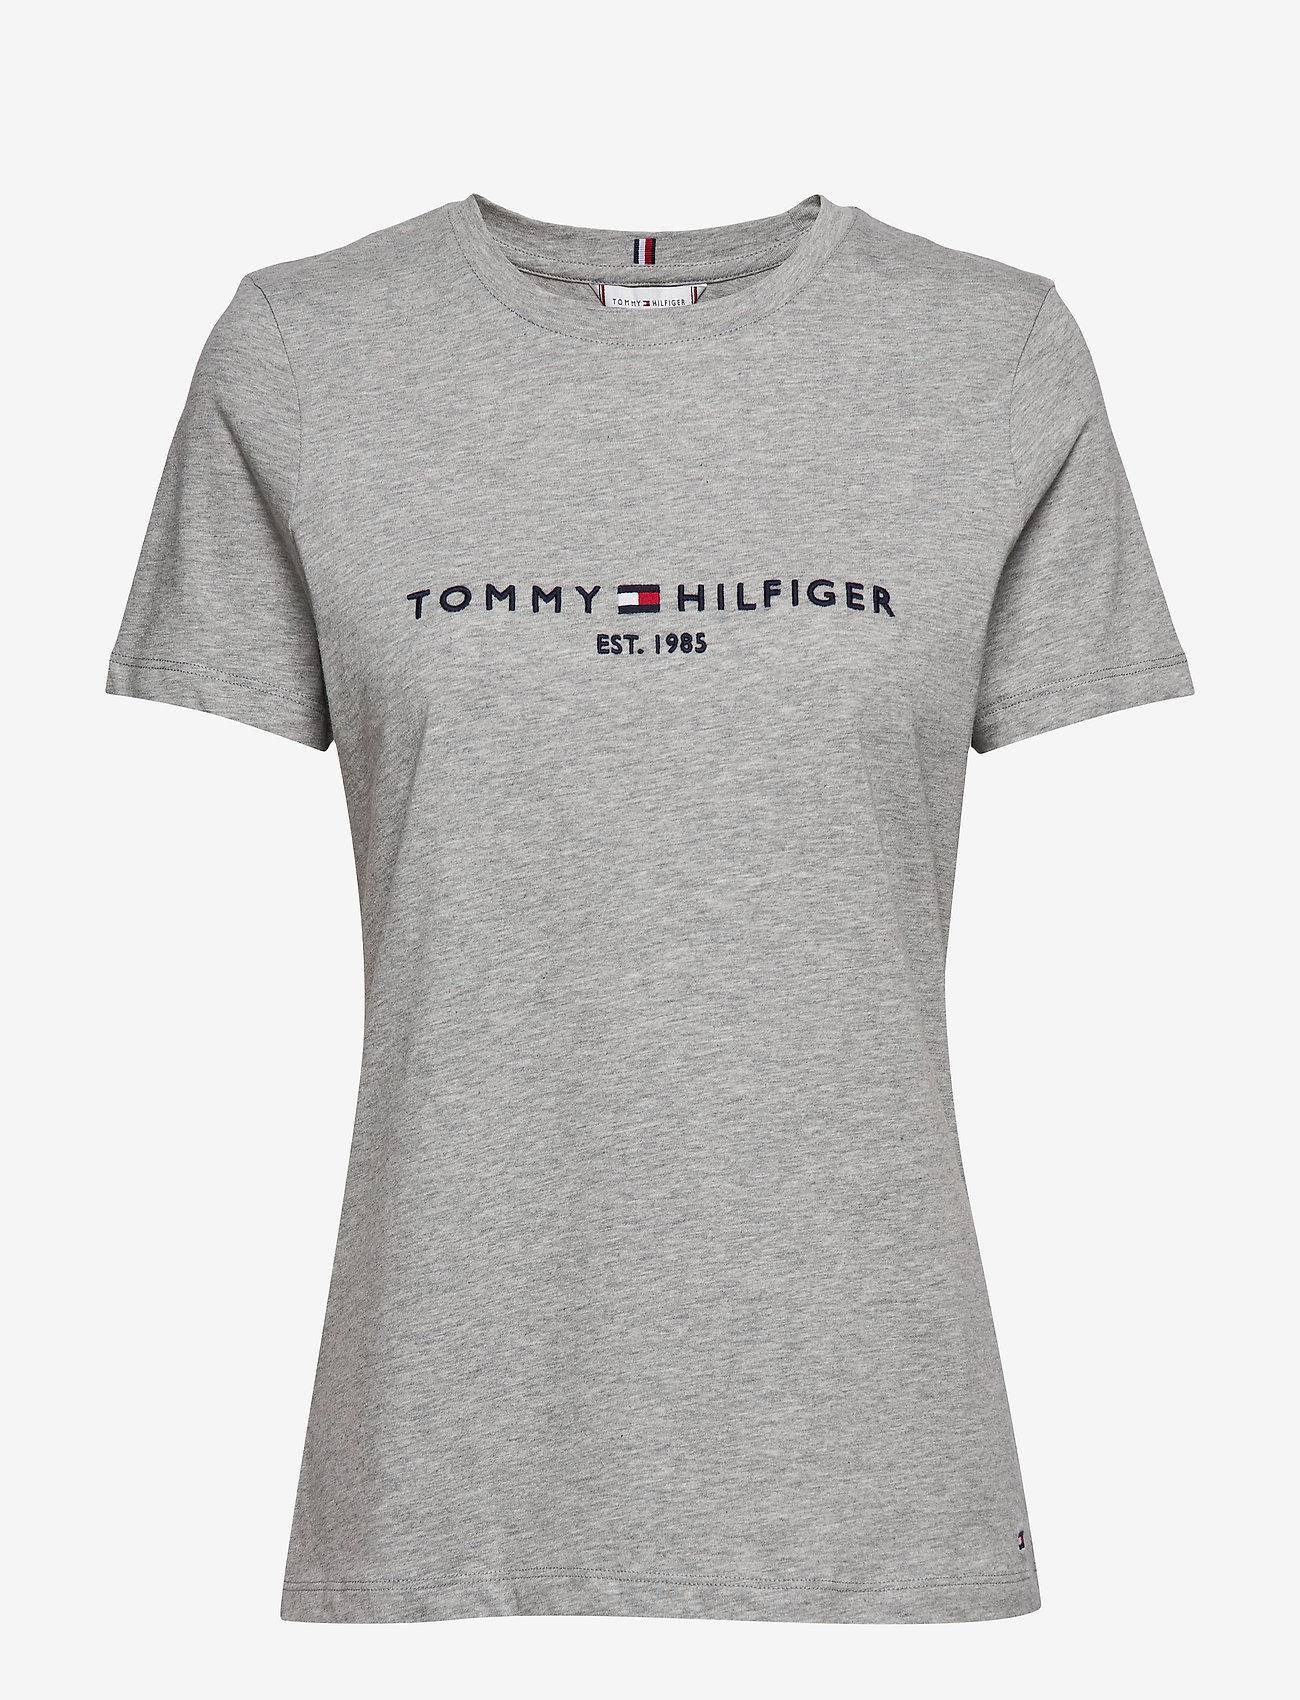 Tommy Hilfiger - NEW TH ESS HILFIGER - logo t-shirts - light grey heather